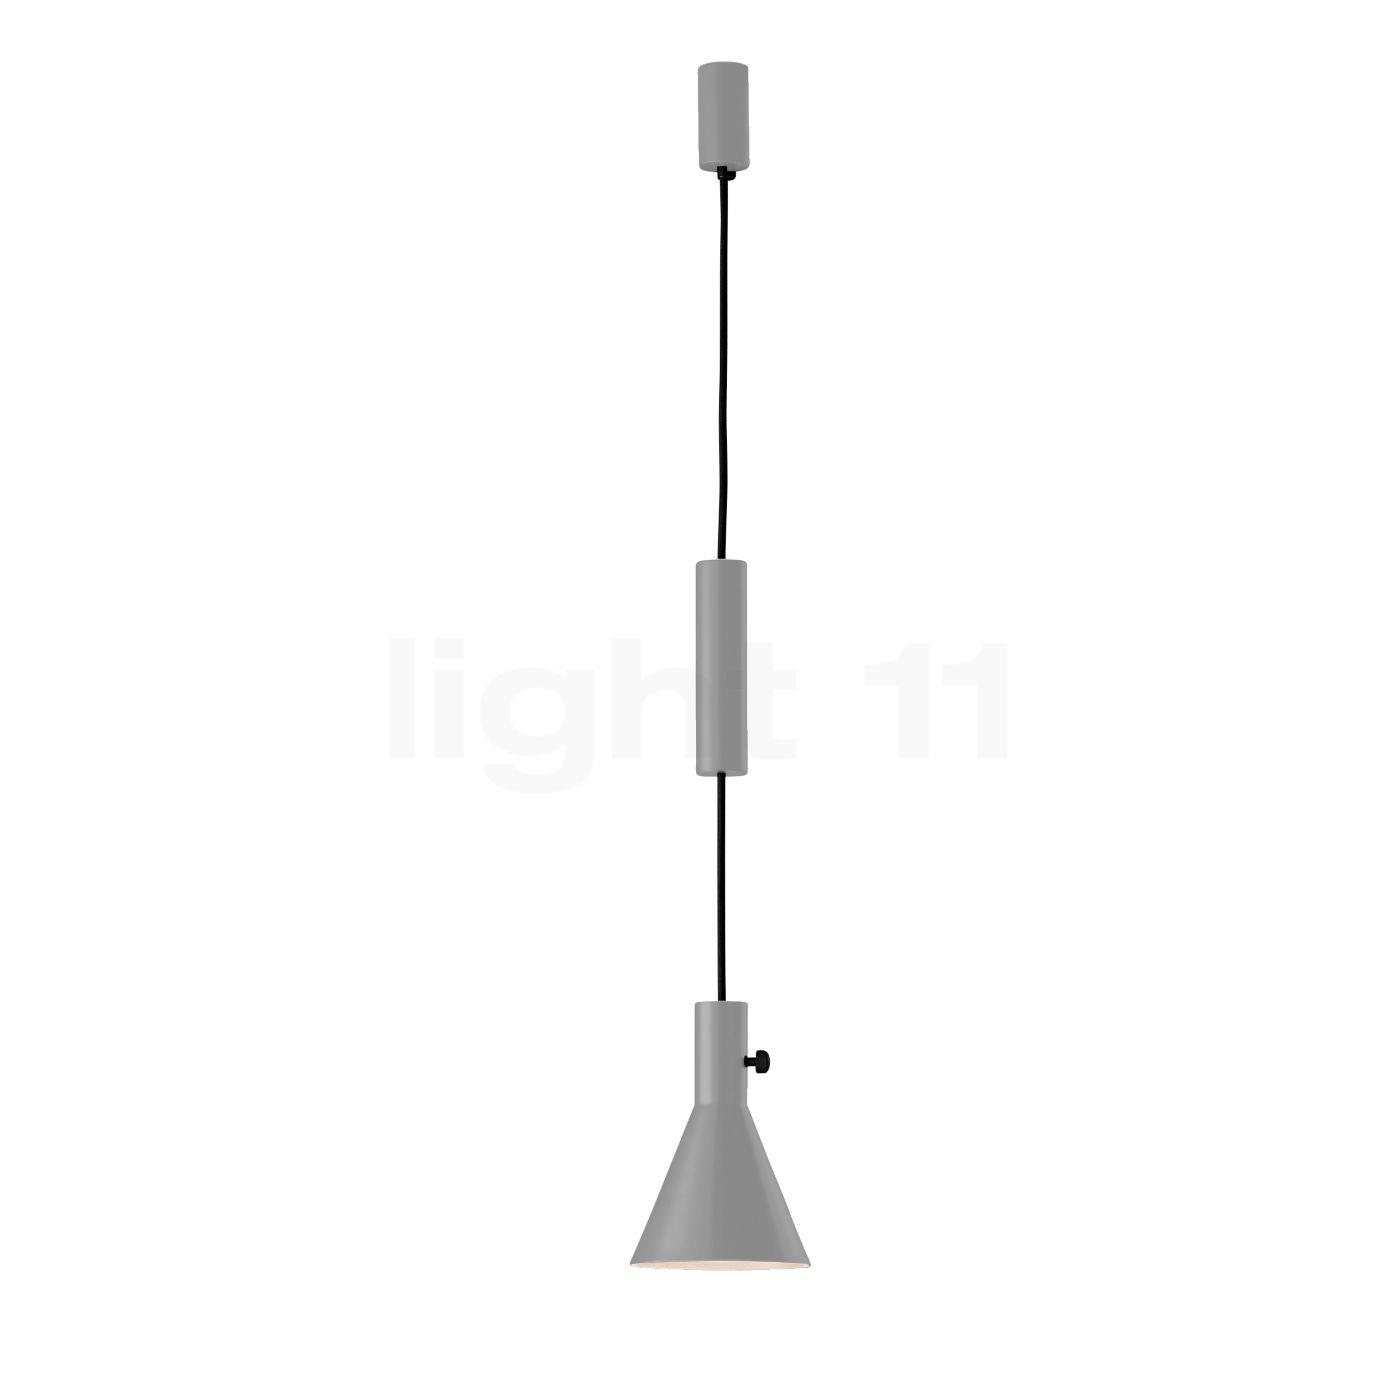 Tecnolumen Eleu Pendelleuchte LED, grau PL 16 GR